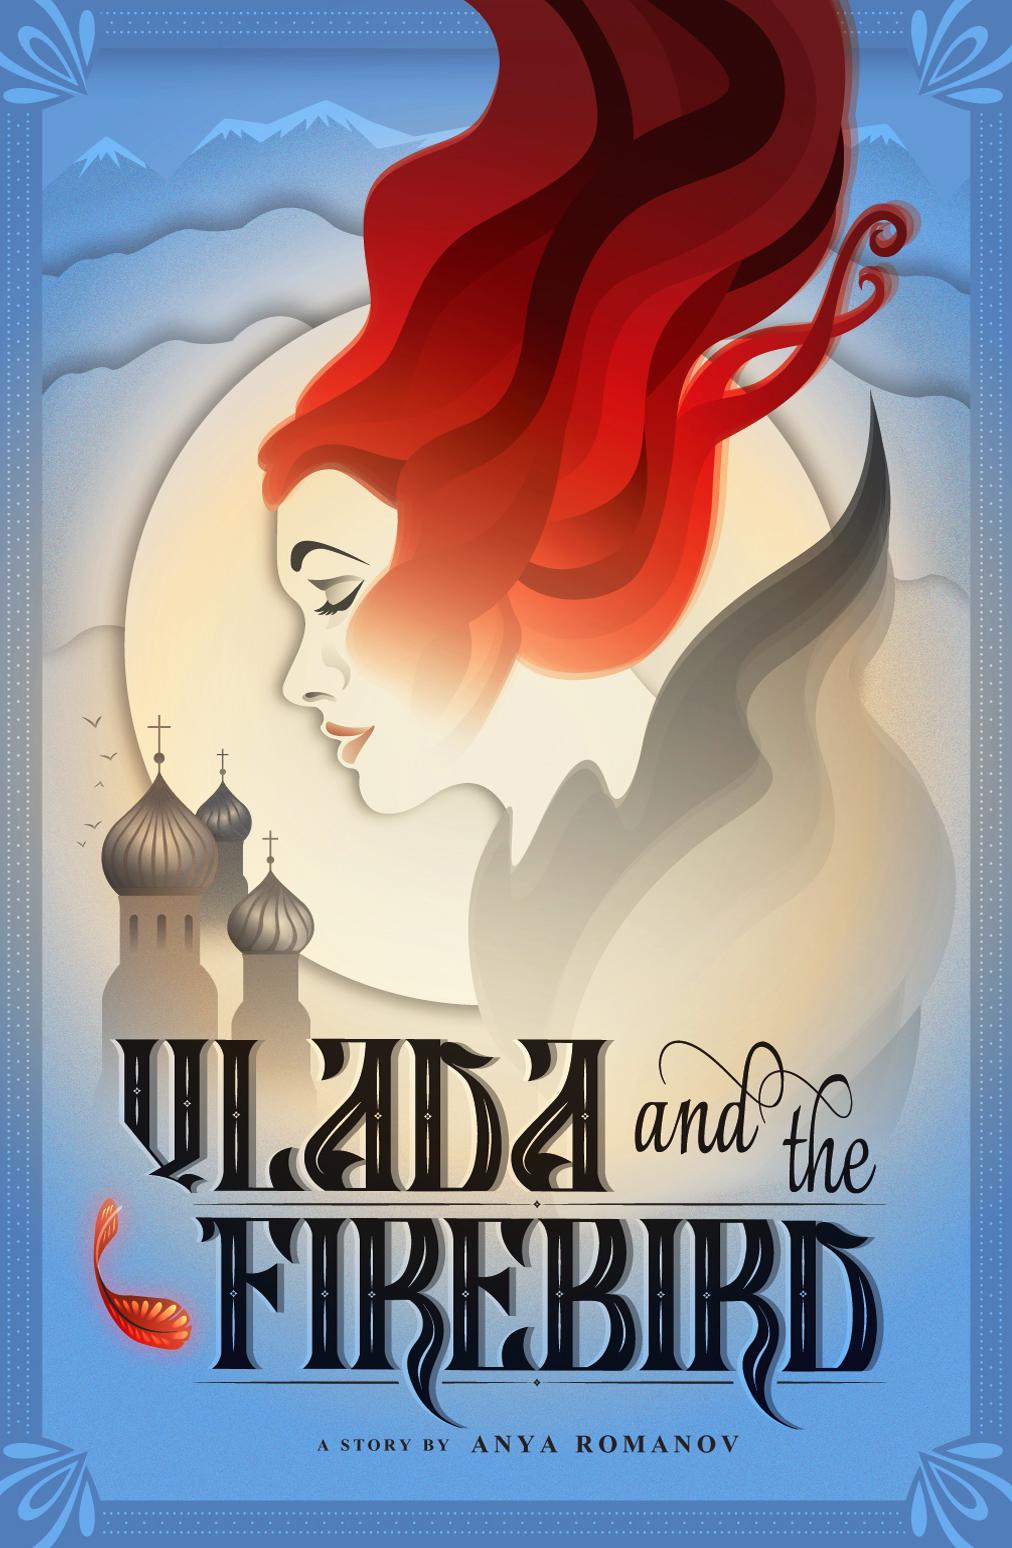 Vlada and the Firebird book cover